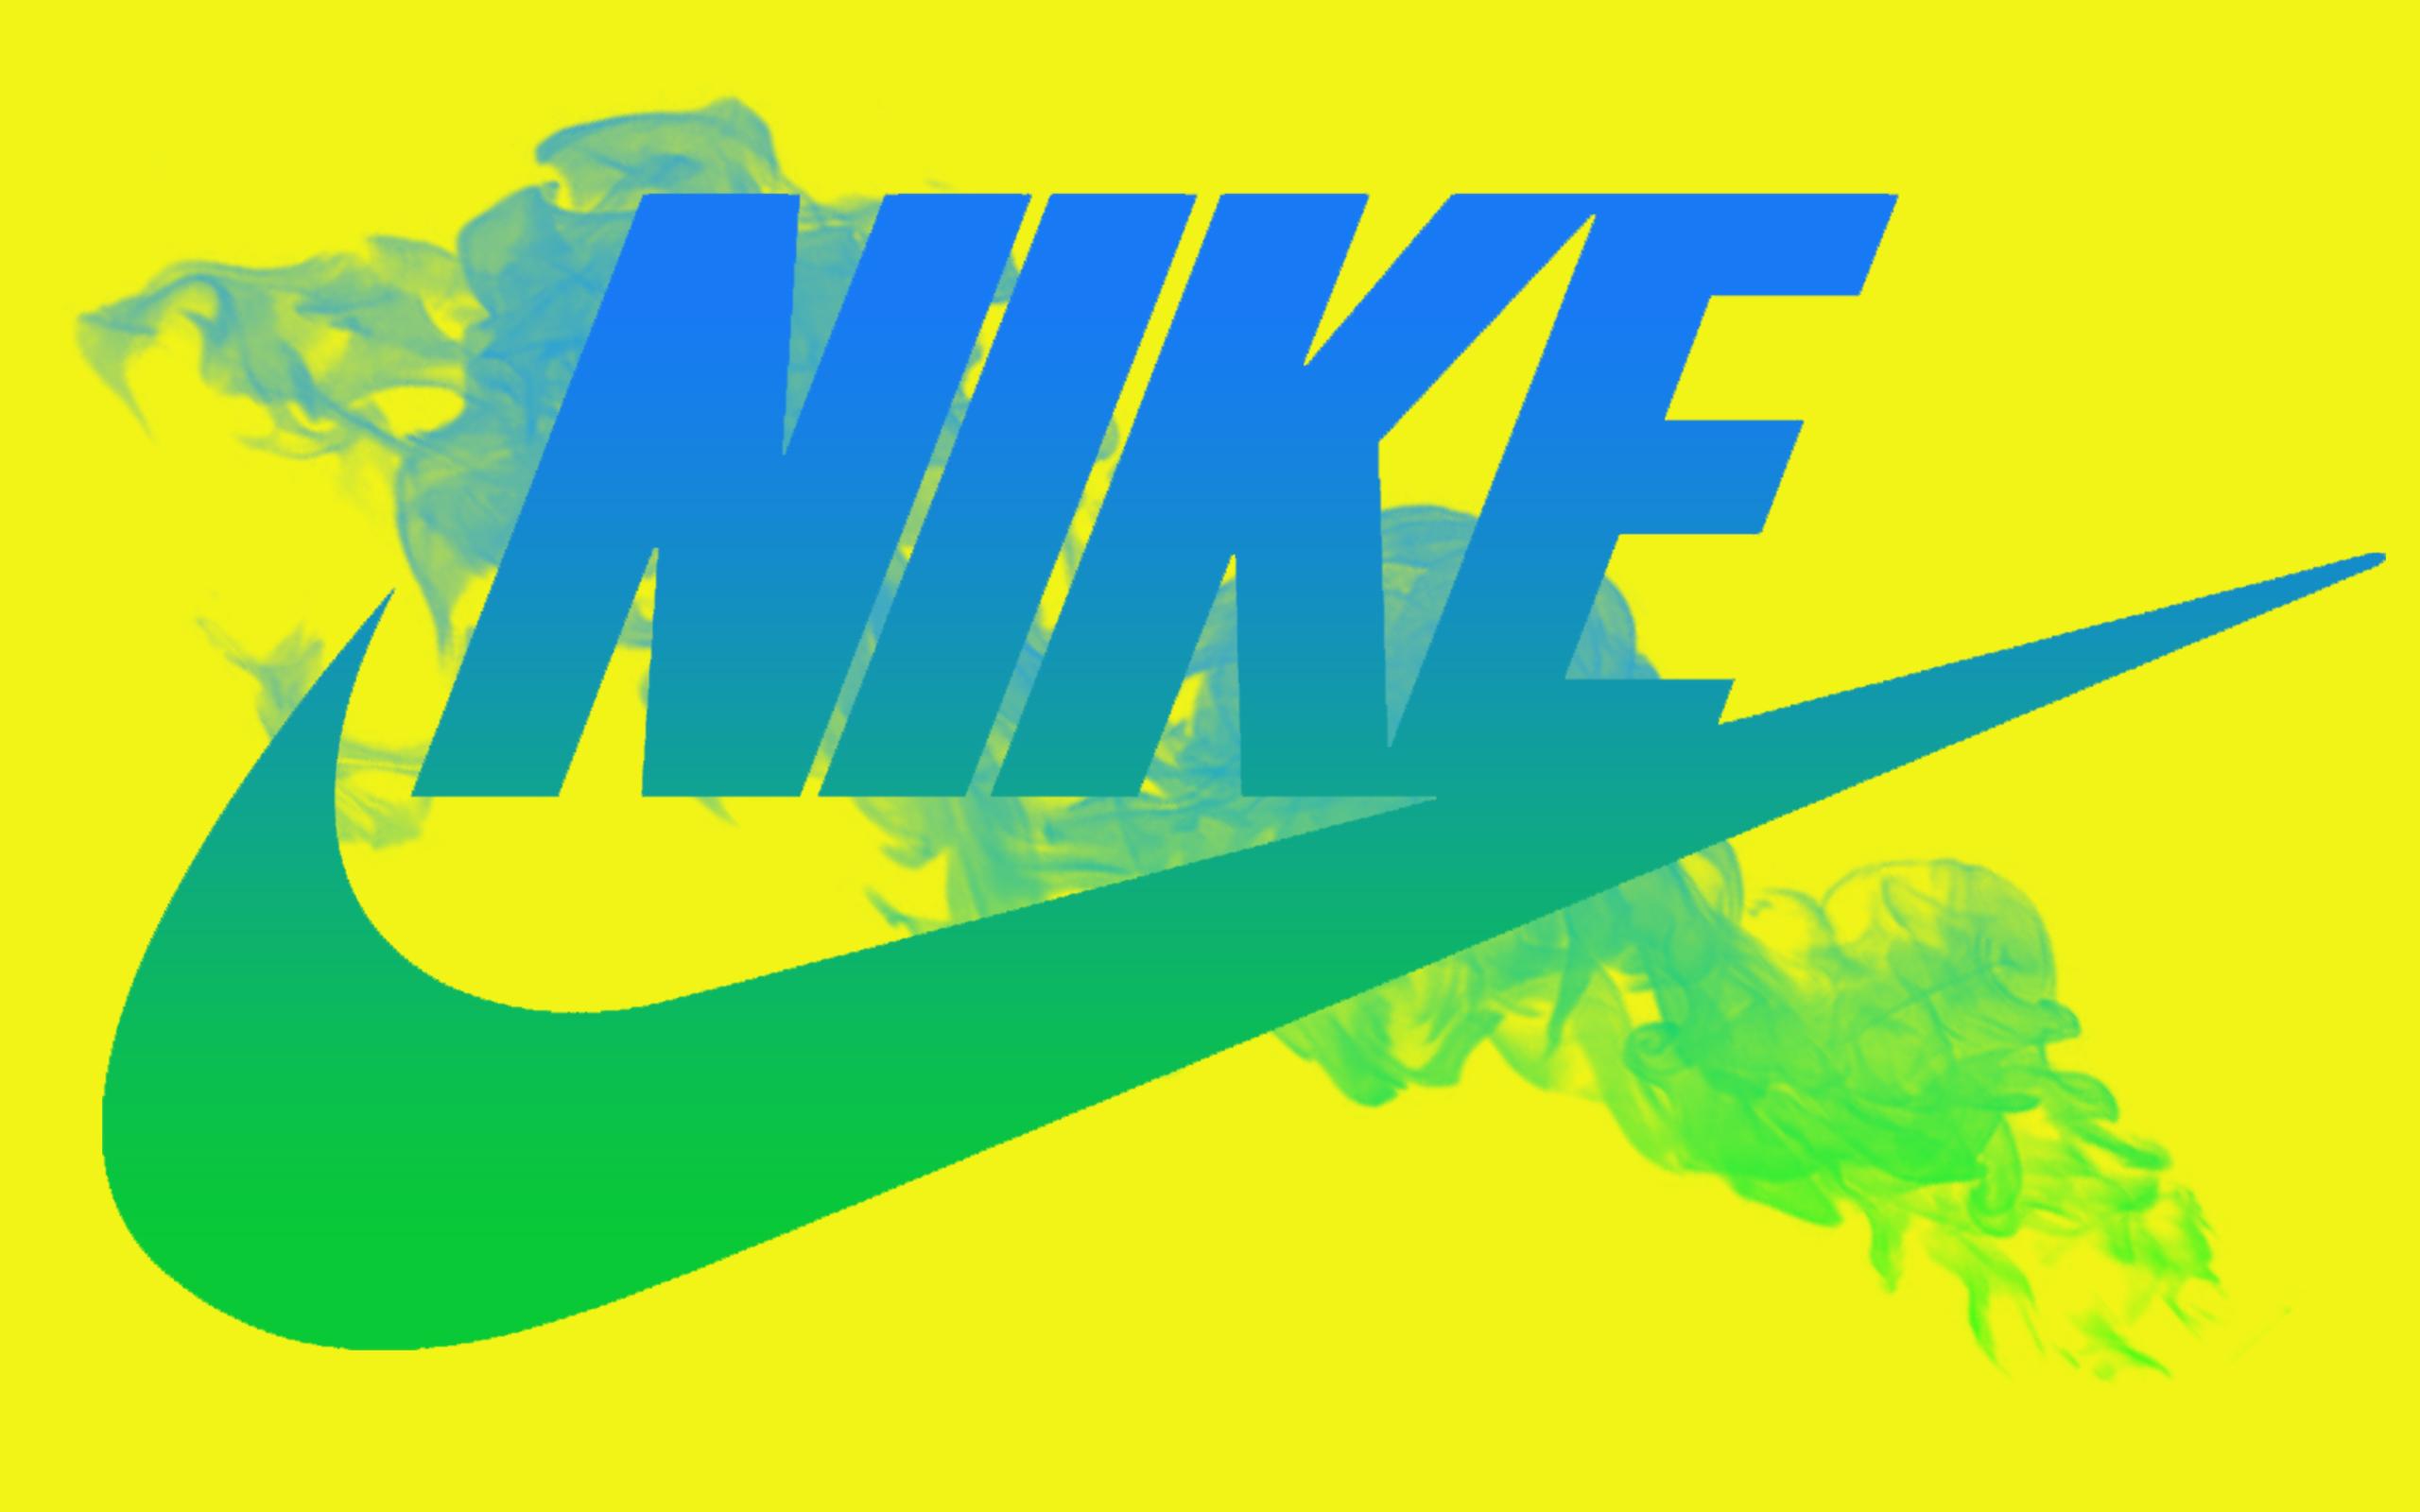 Neon Nike Wallpapers Neon Nike Myspace Backgrounds Neon Nike 2560x1600